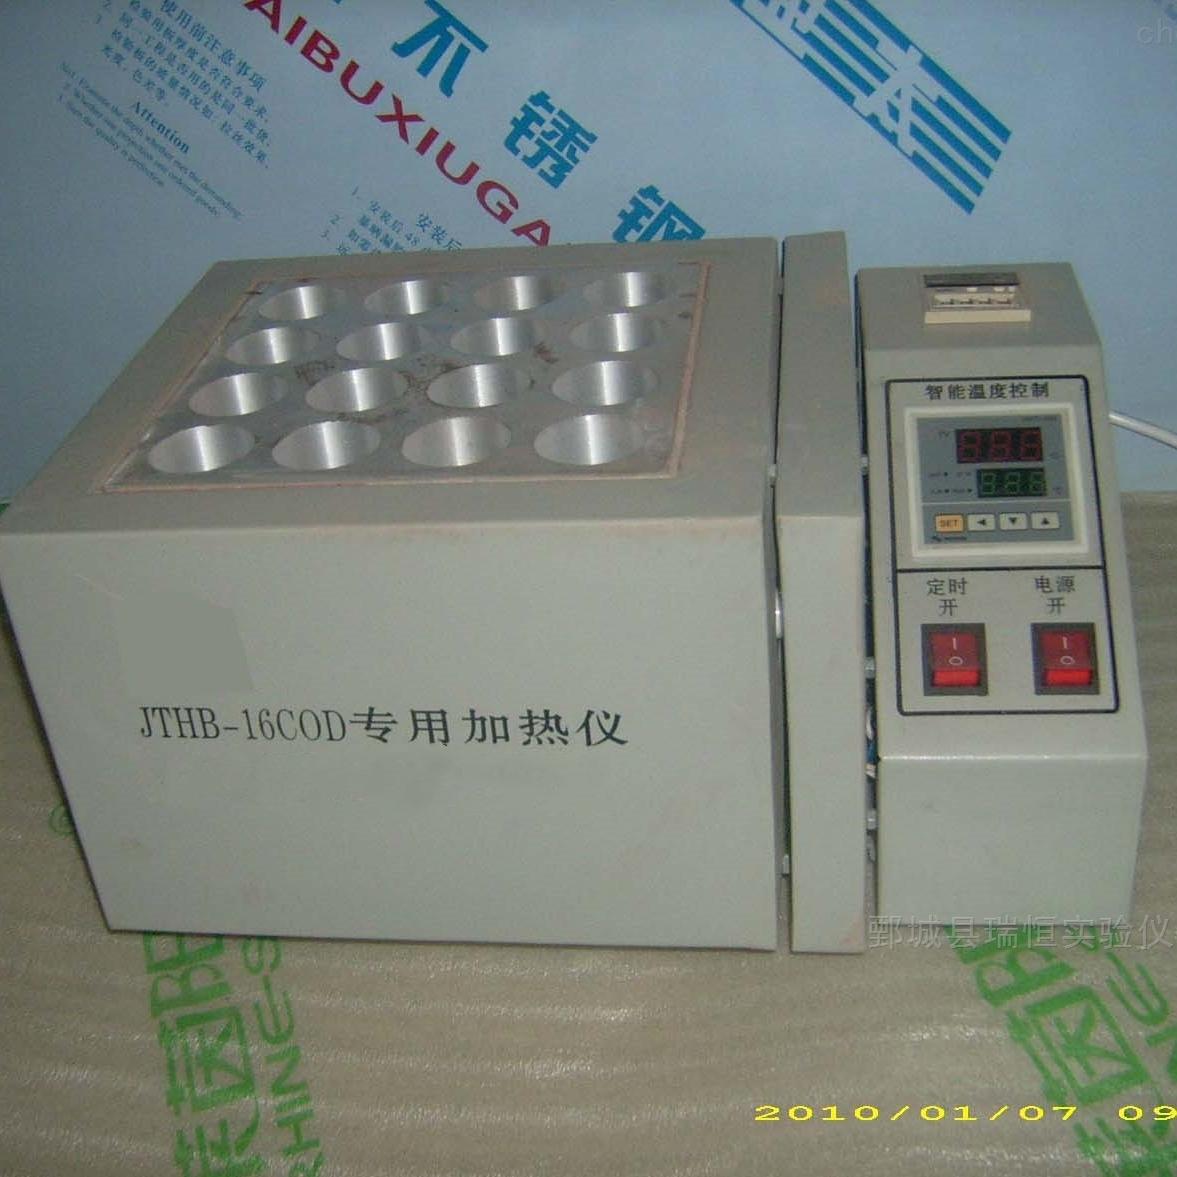 JTHB-16COD加热仪